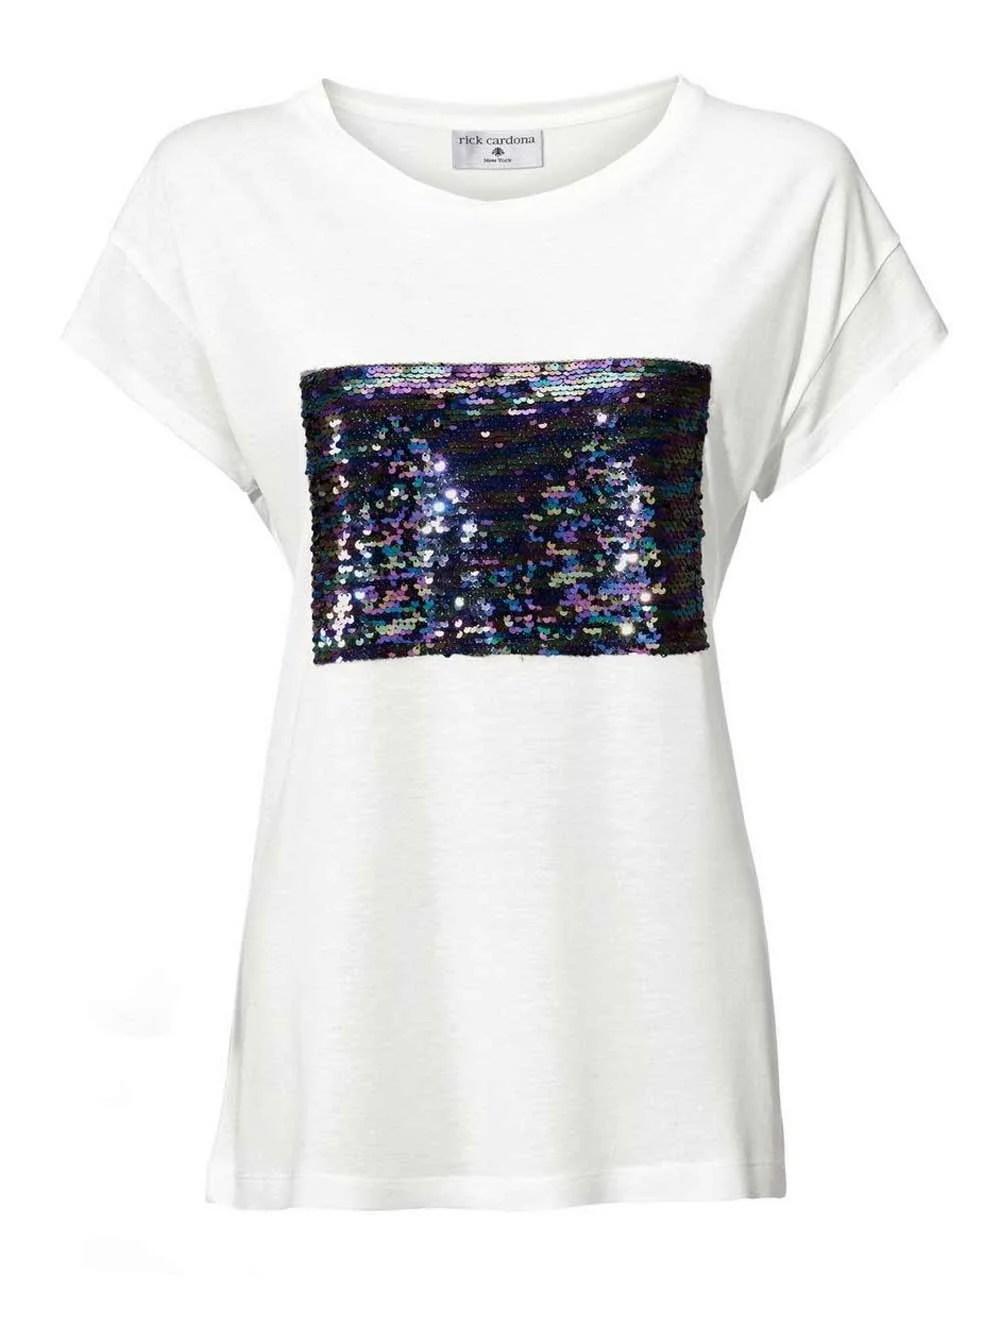 014.502 Rick Cardona Shirt mit Pailletten, ecru